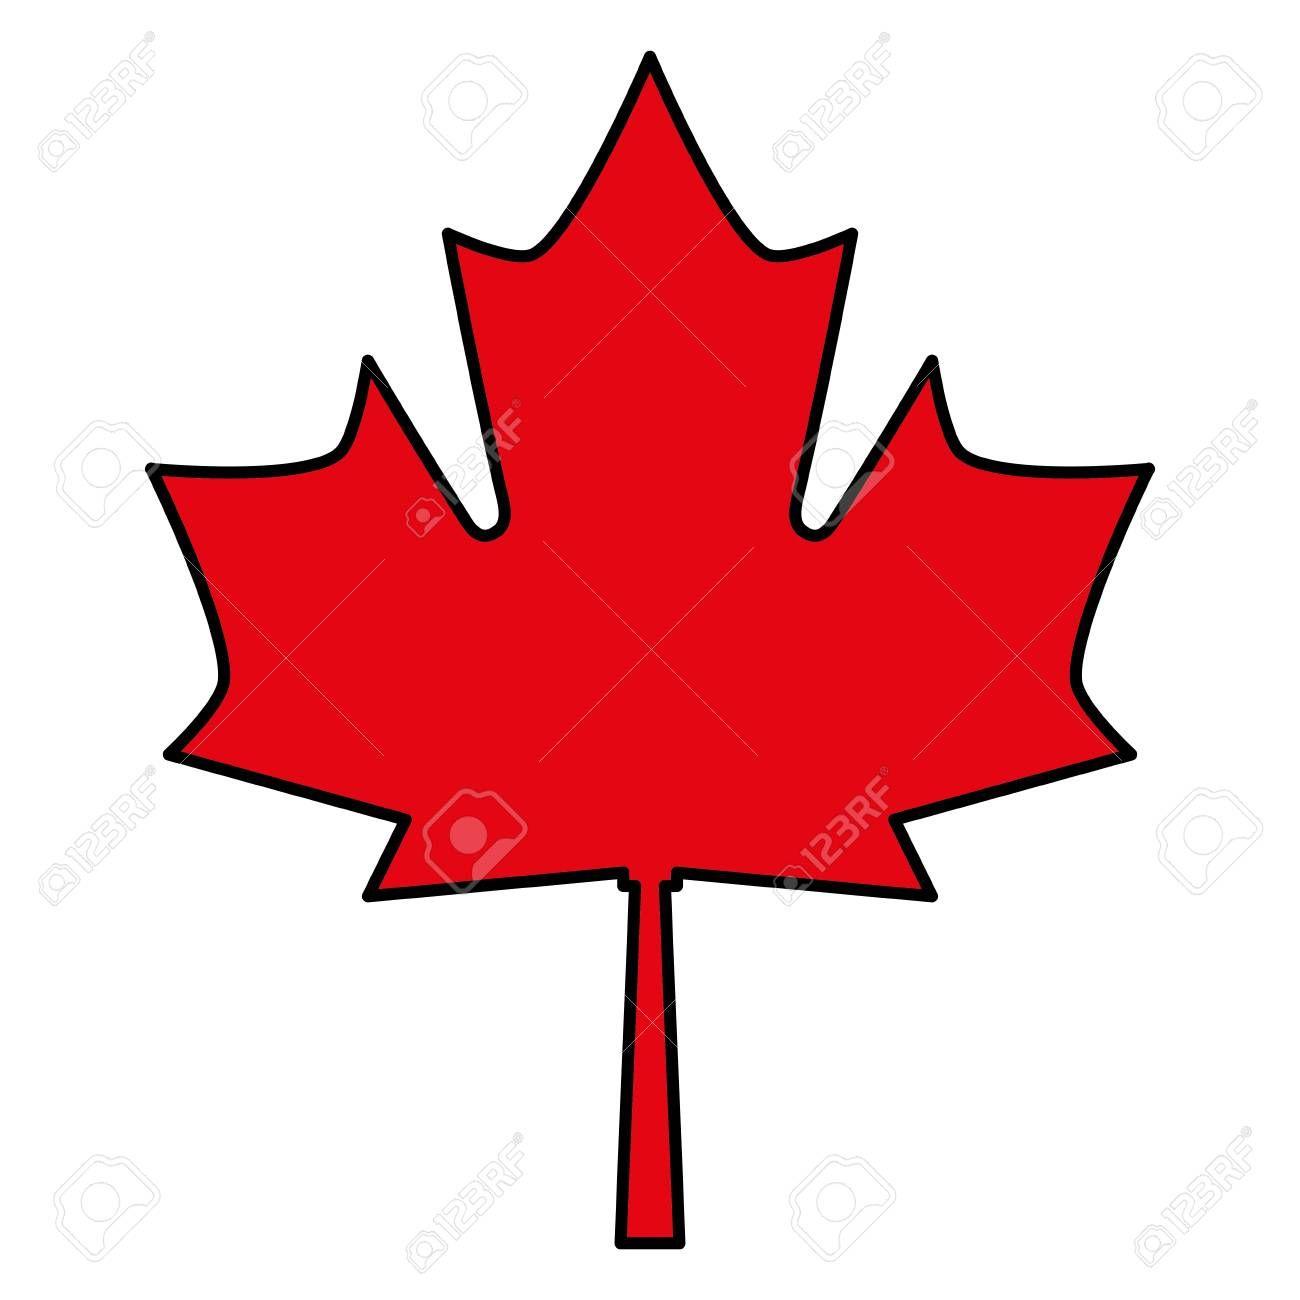 Red Maple Leaf Canadian Symbol Vector Illustration Illustration Ad Leaf Canadian Red Maple Il Canadian Symbols Vector Illustration Art Inspiration